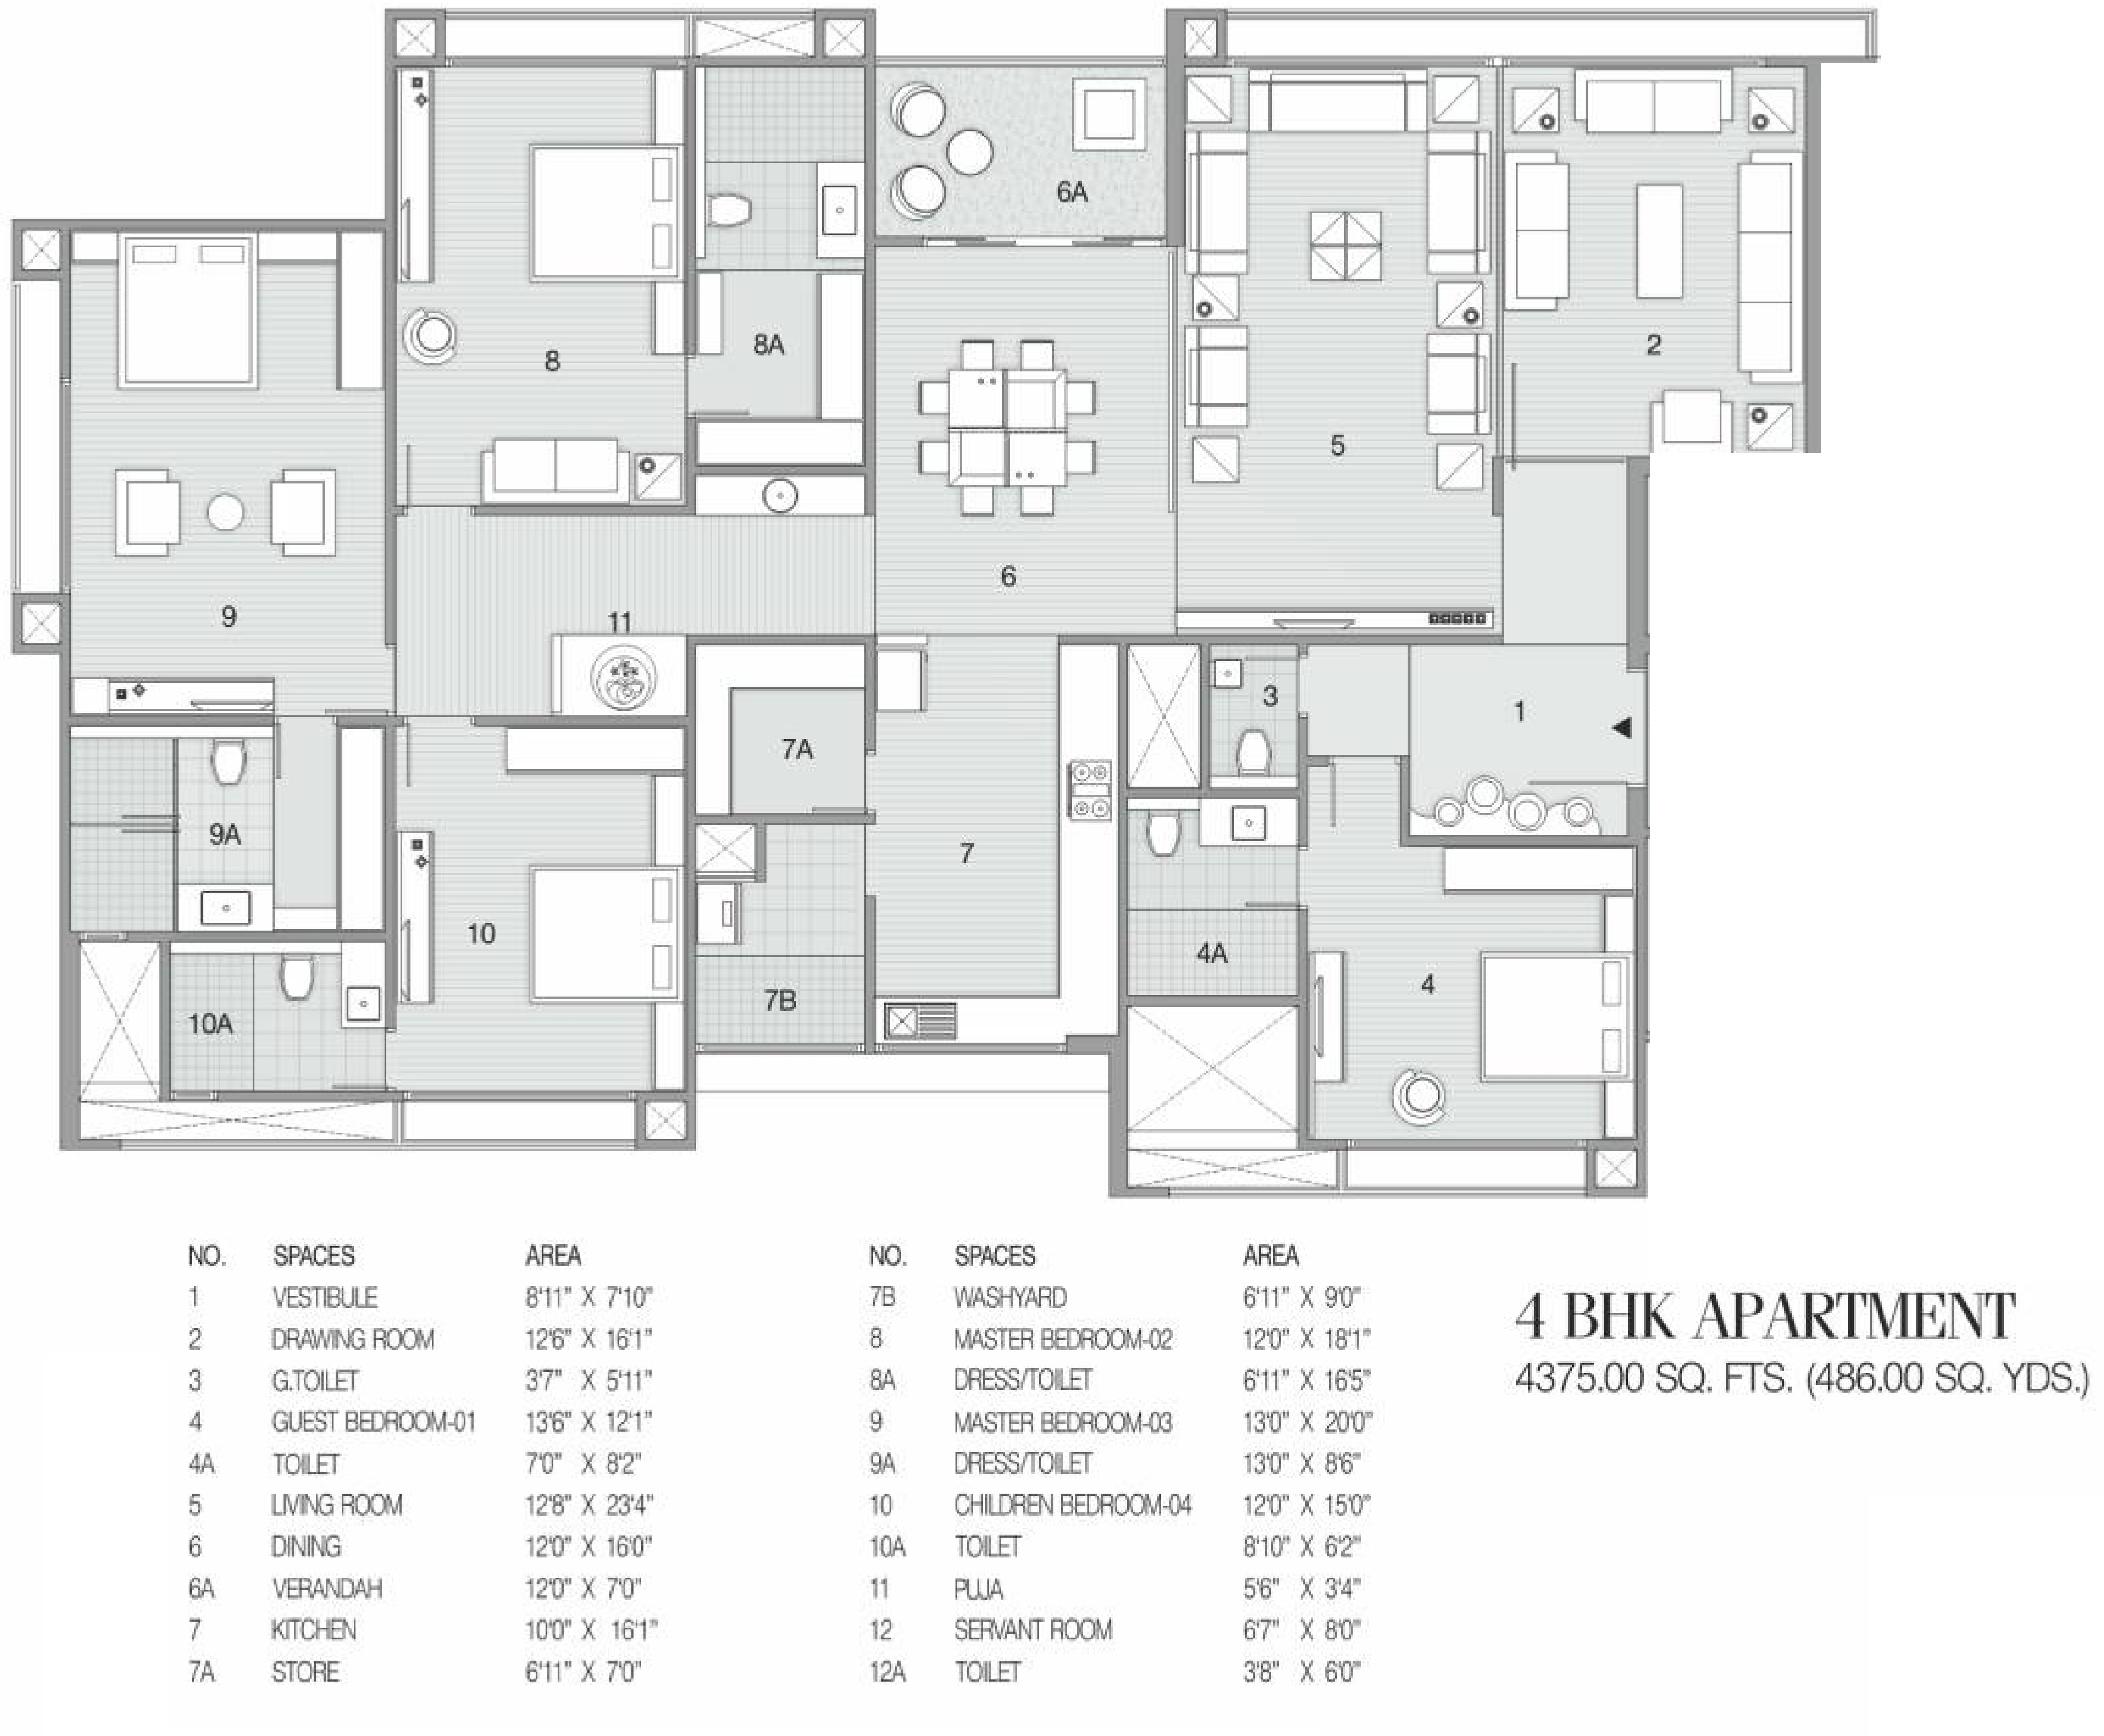 residences floor plan floor plan 3770006?width\=90\&height\=120 john deere 445 wiring diagram wiring diagram and schematic design z225 wiring diagram at readyjetset.co